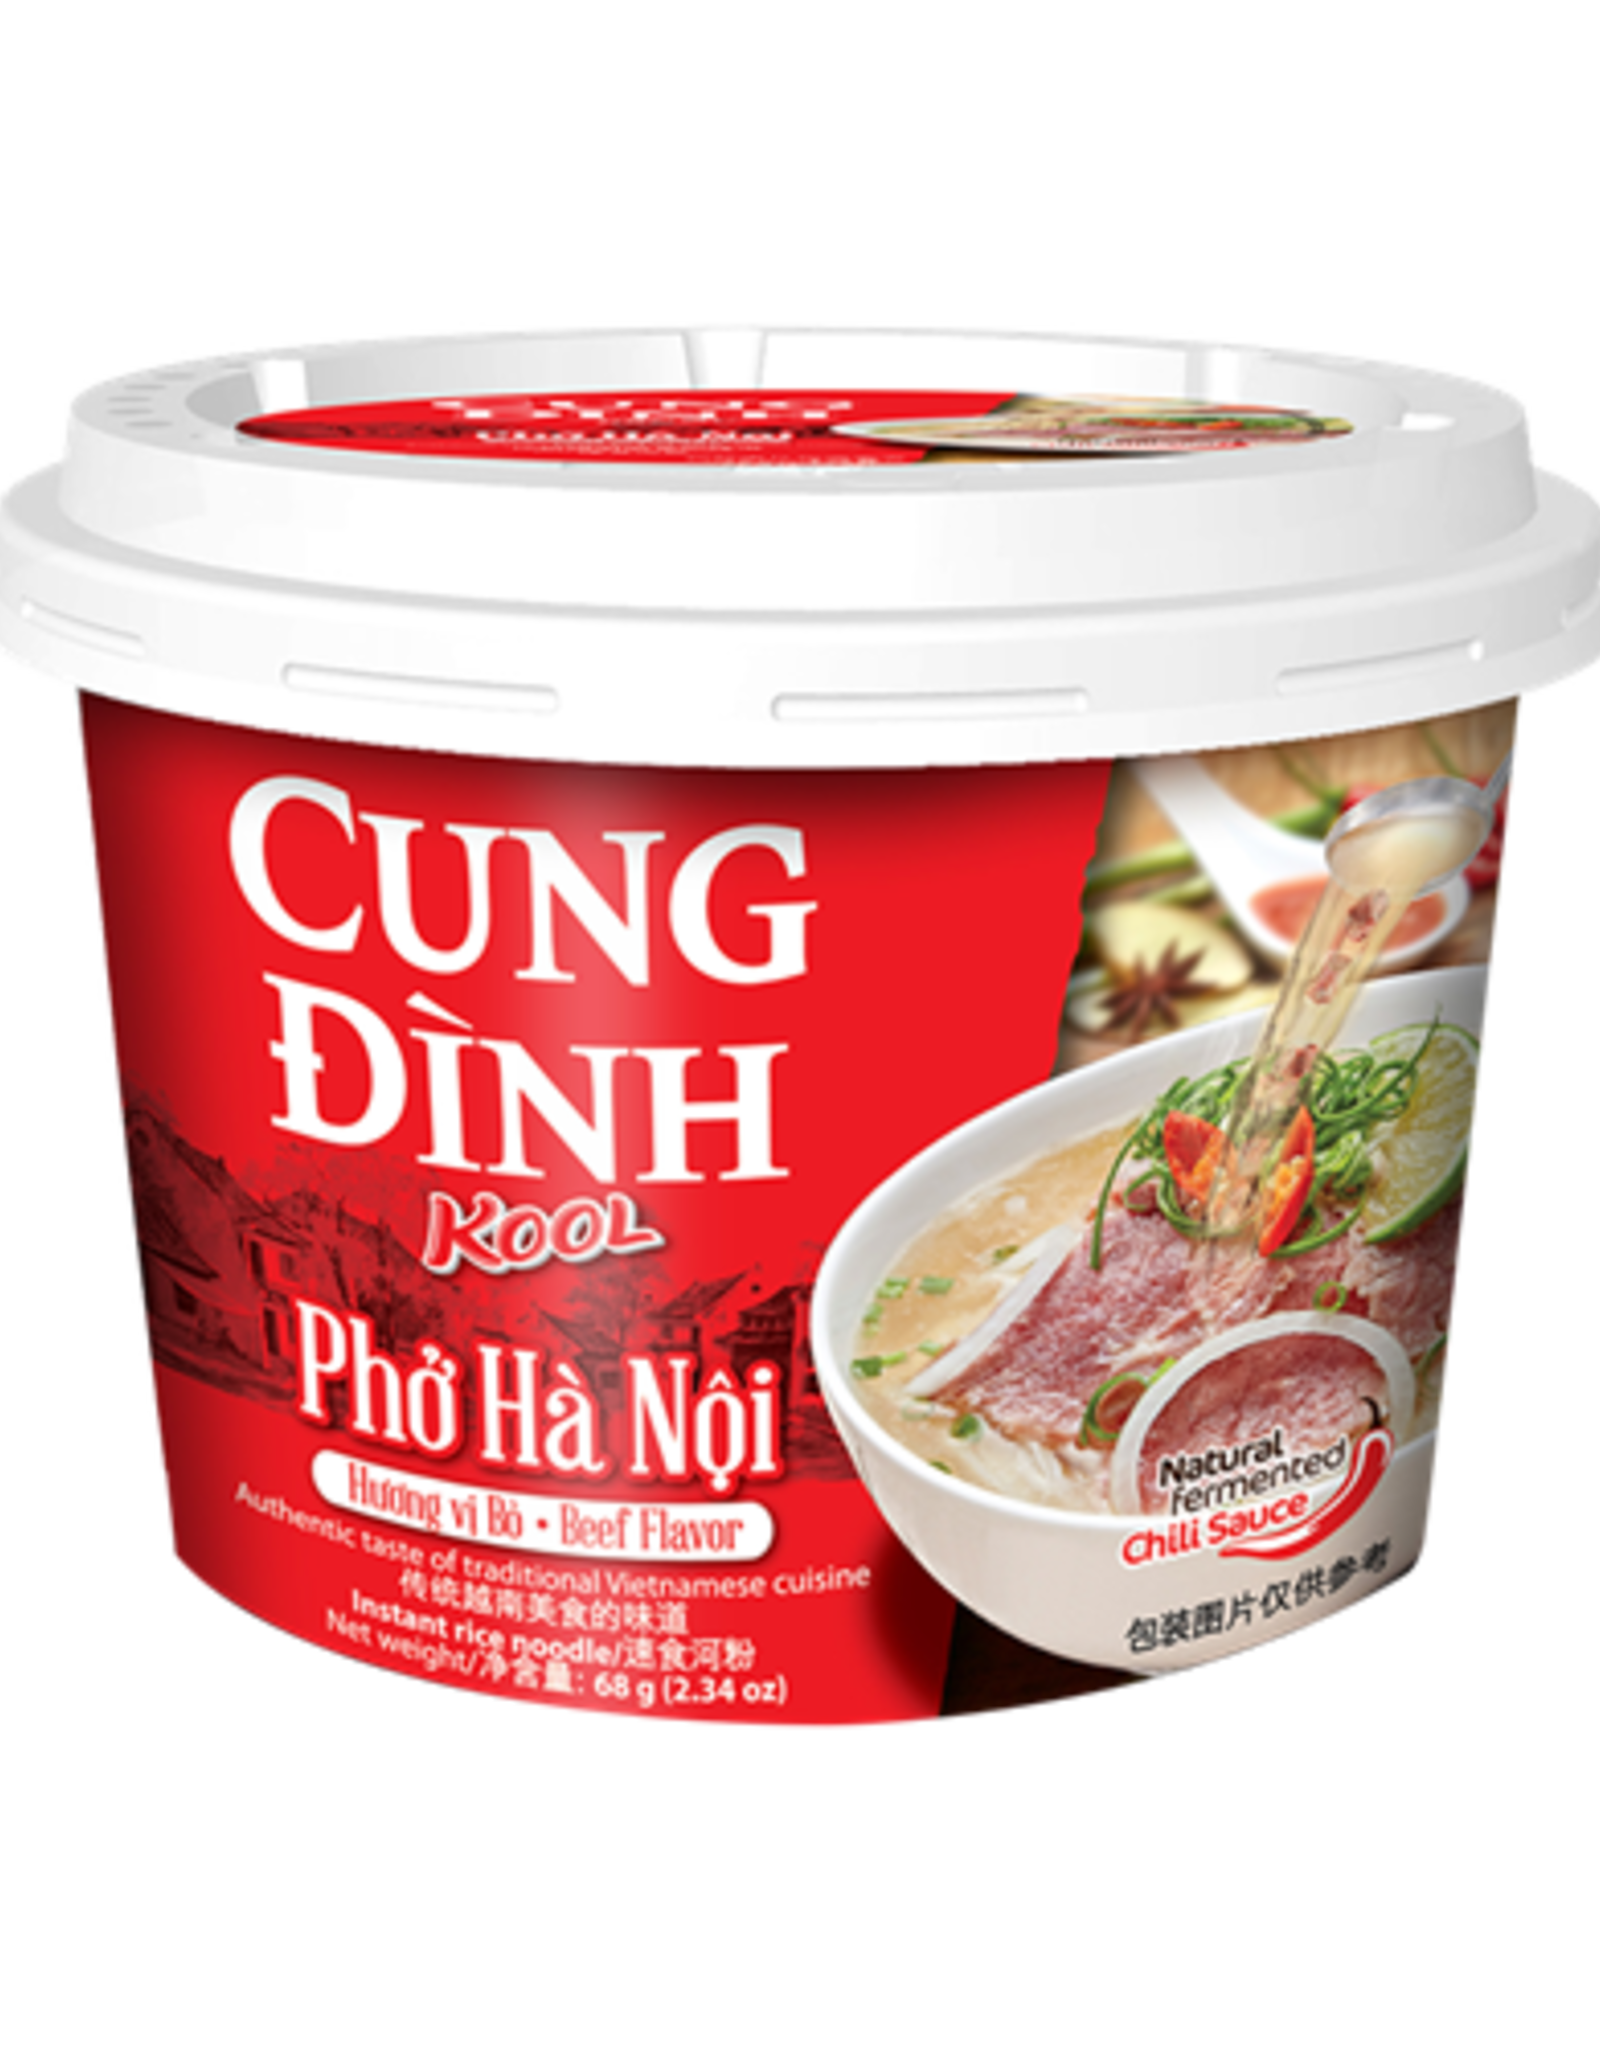 Cung Dinh Inst Rijstnoedels Kool Merk - Pho Bo (Cup) 68g